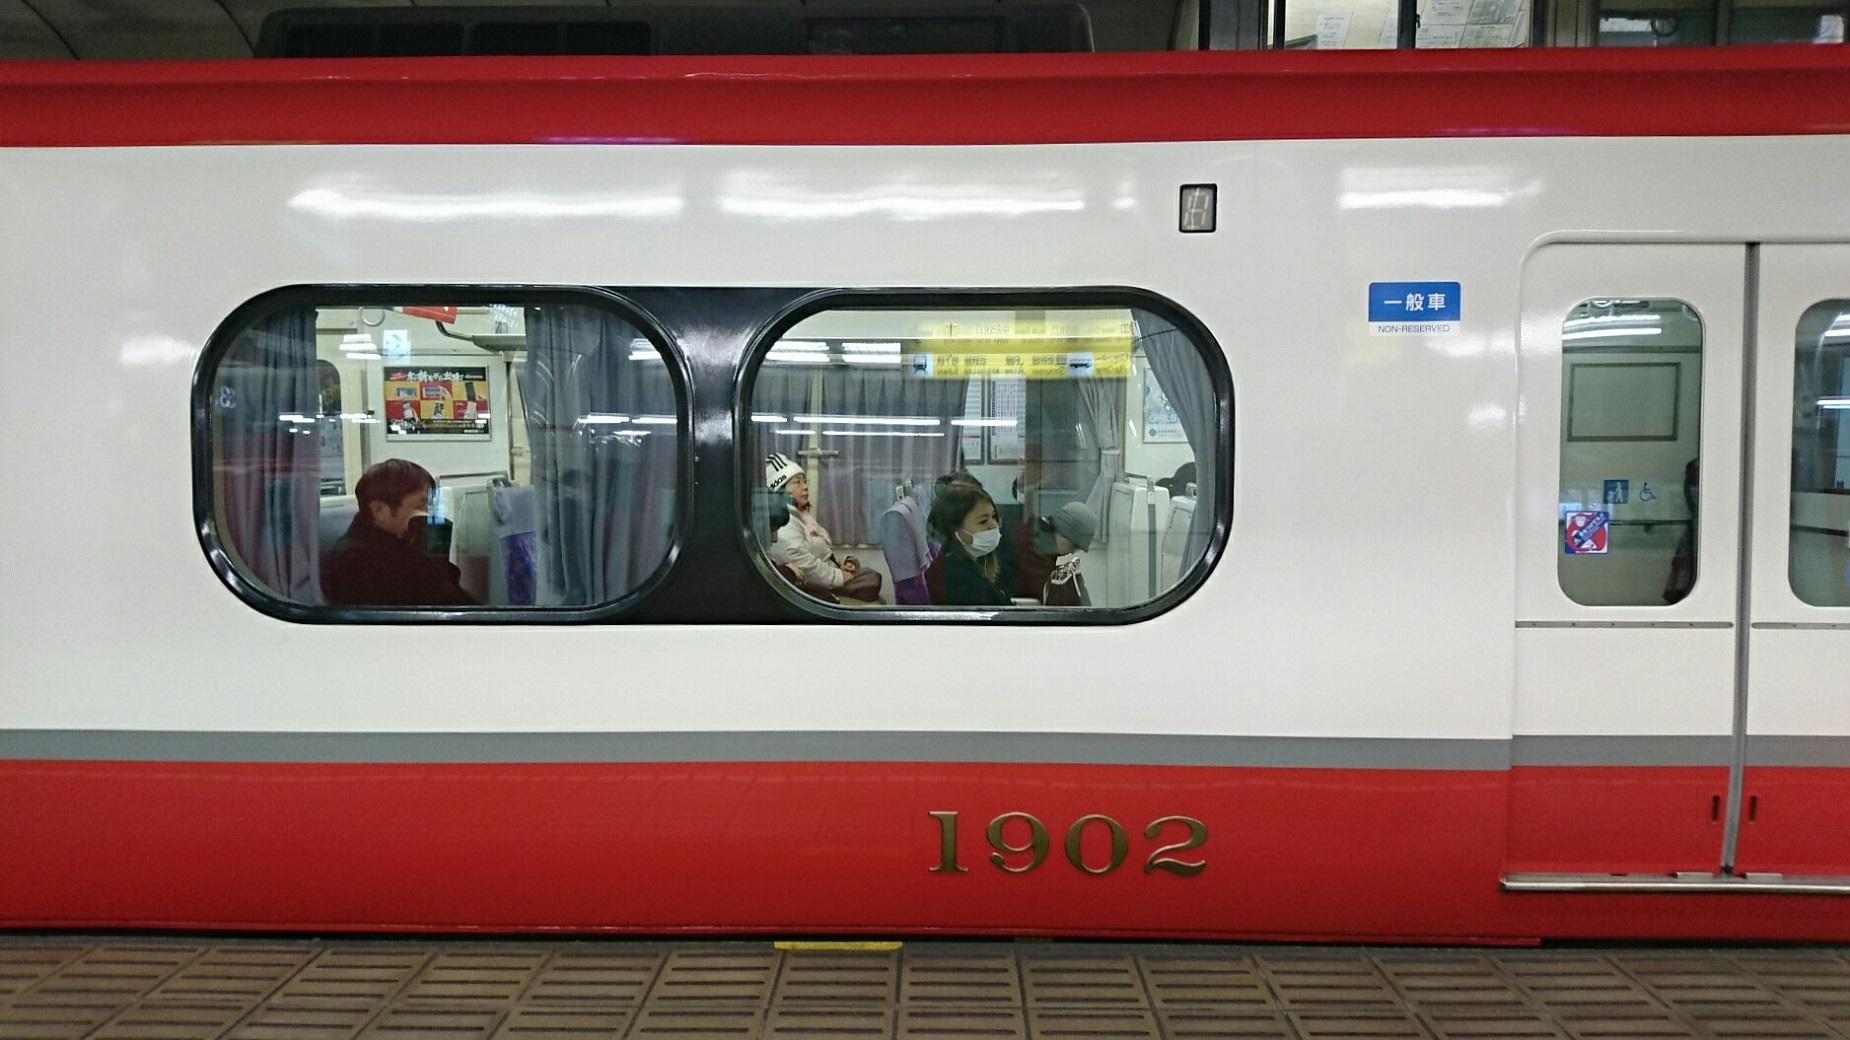 2017.12.14 名古屋 (14) 名古屋 - 岐阜いき特急 1850-1040